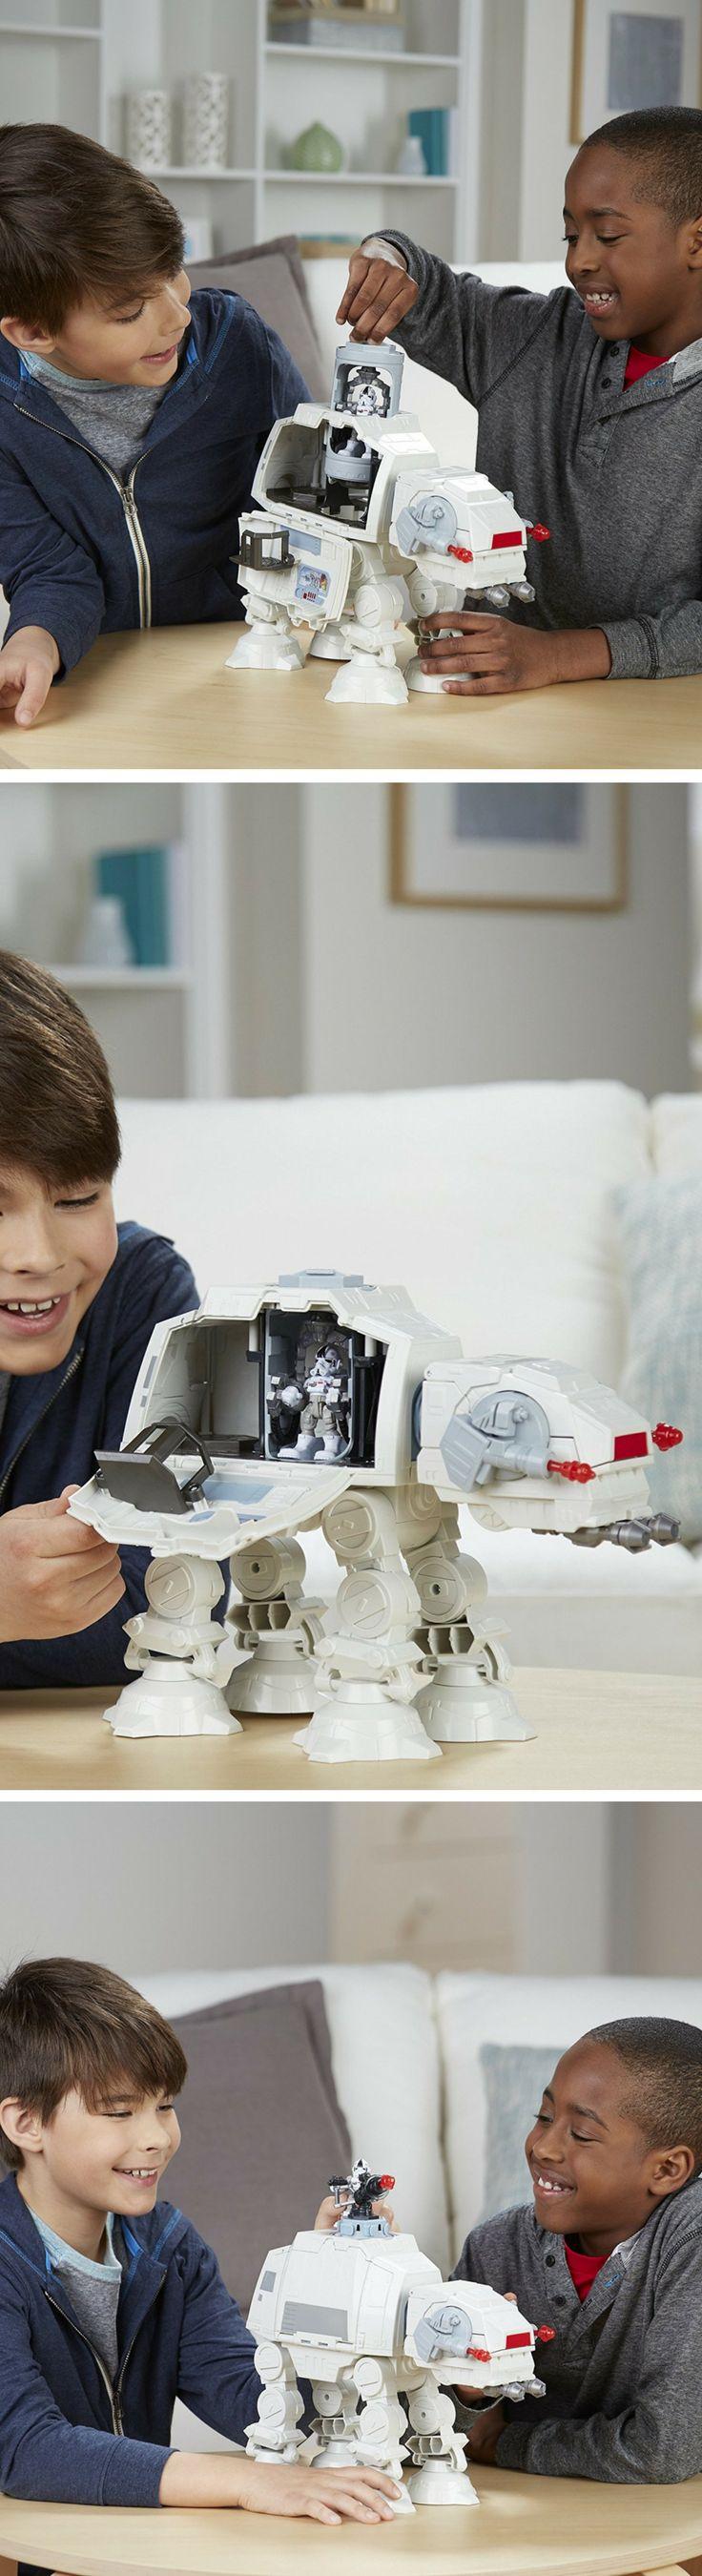 Star Wars Galactic Heroes Imperial AT-AT Fortress - Star Wars Gifts for kids #starwars #gifts #kids